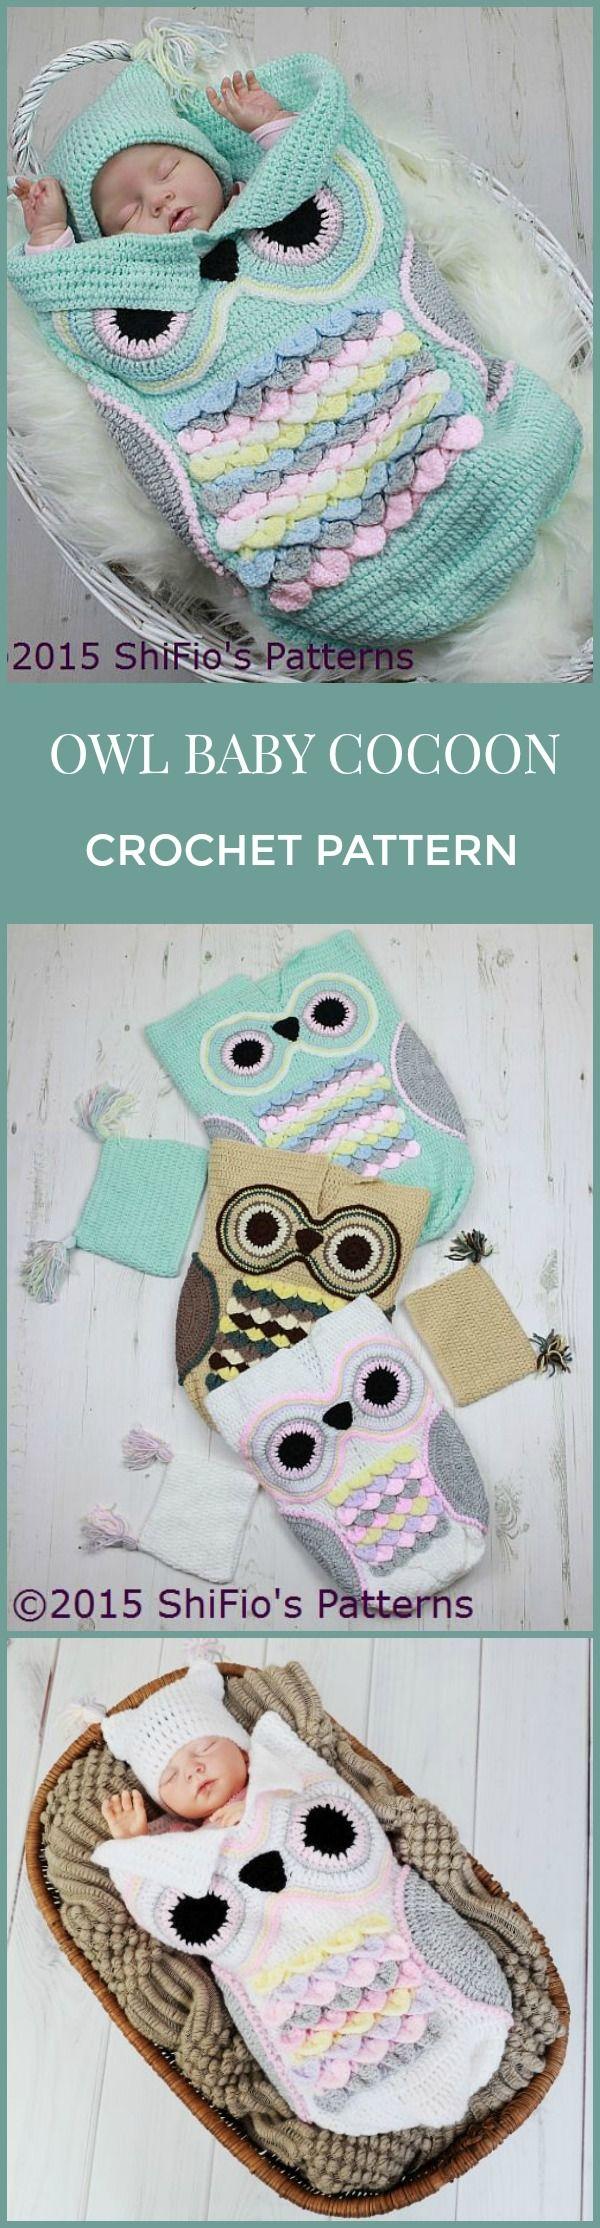 Oh, so cute! I love owls! CROCHET PATTERN For Owl  Baby Cocoon, Papoose & Hat in 3 Sizes U.K, U.S.A, Deutsch, Francais,  Dutch,  PDF Digital Download #crochet #cocoon #pattern #affiliate #pdf